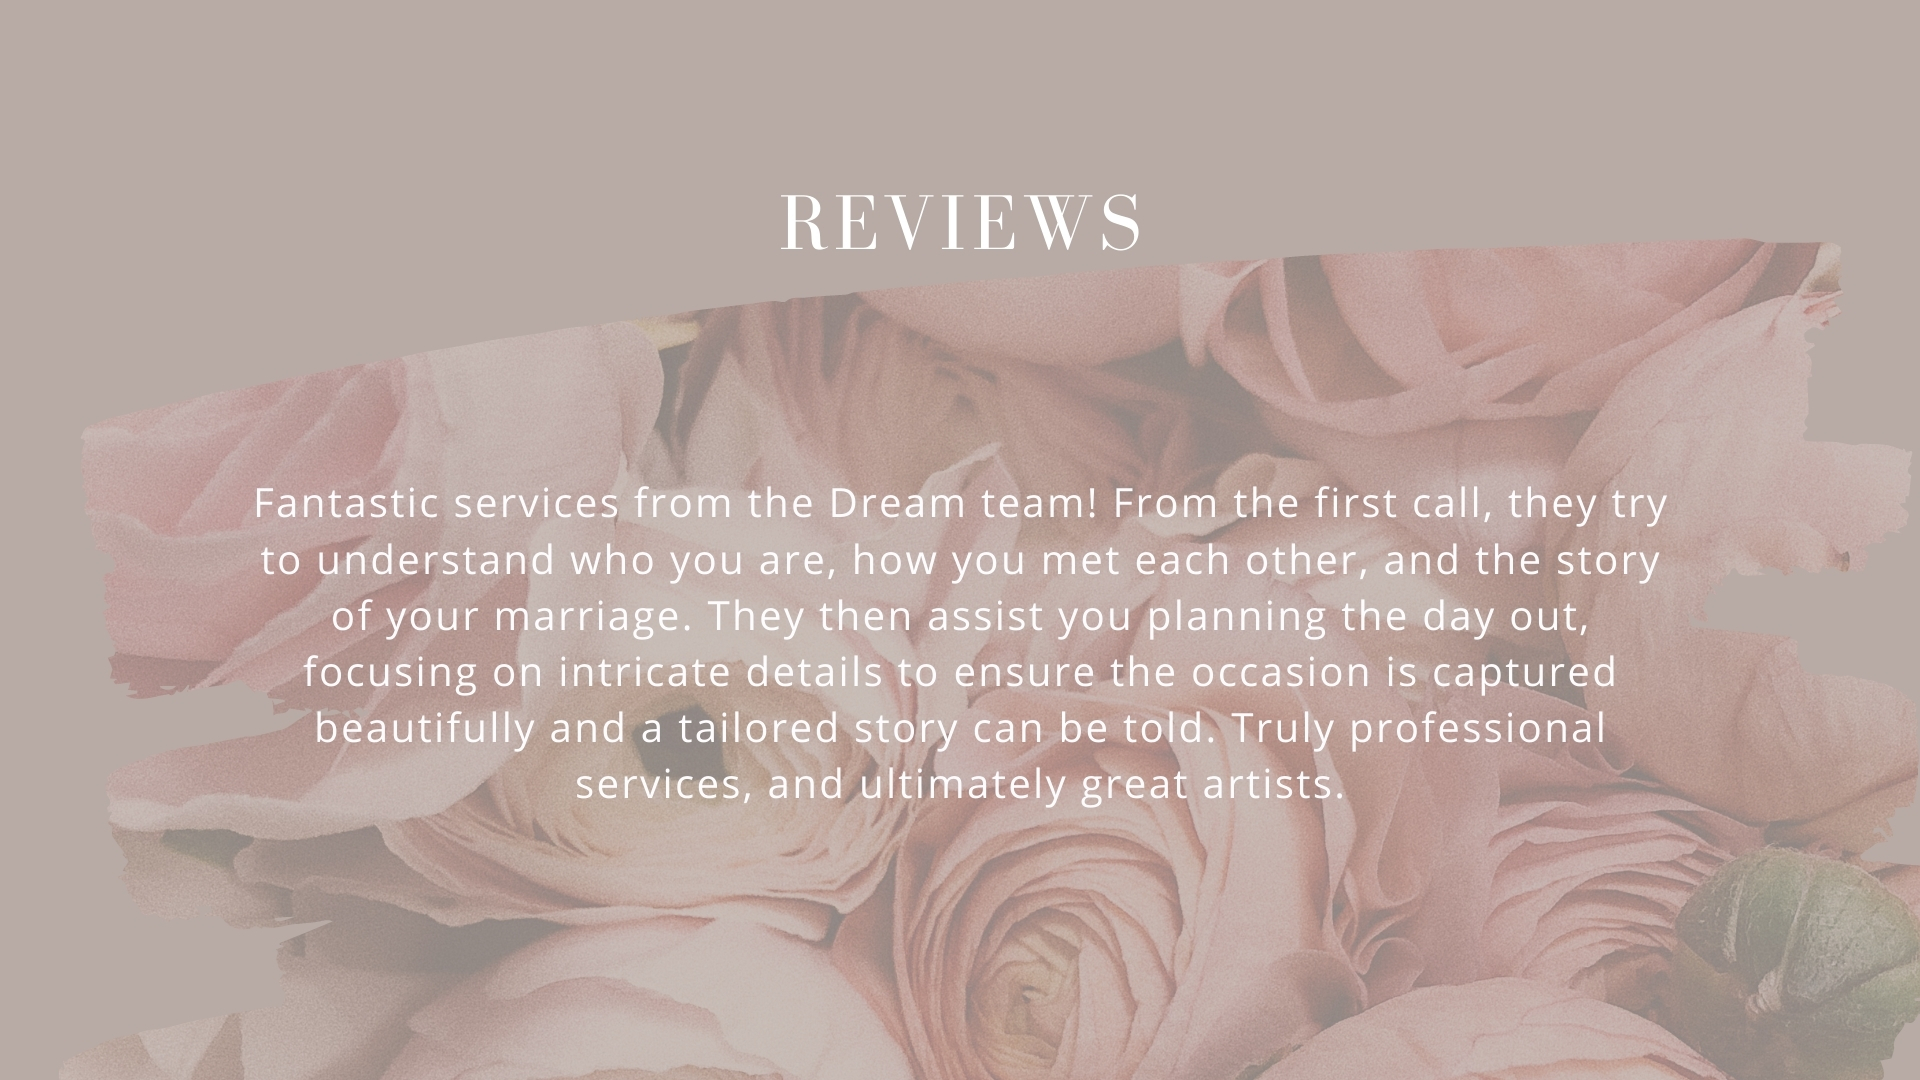 Wedding photographer website reviews